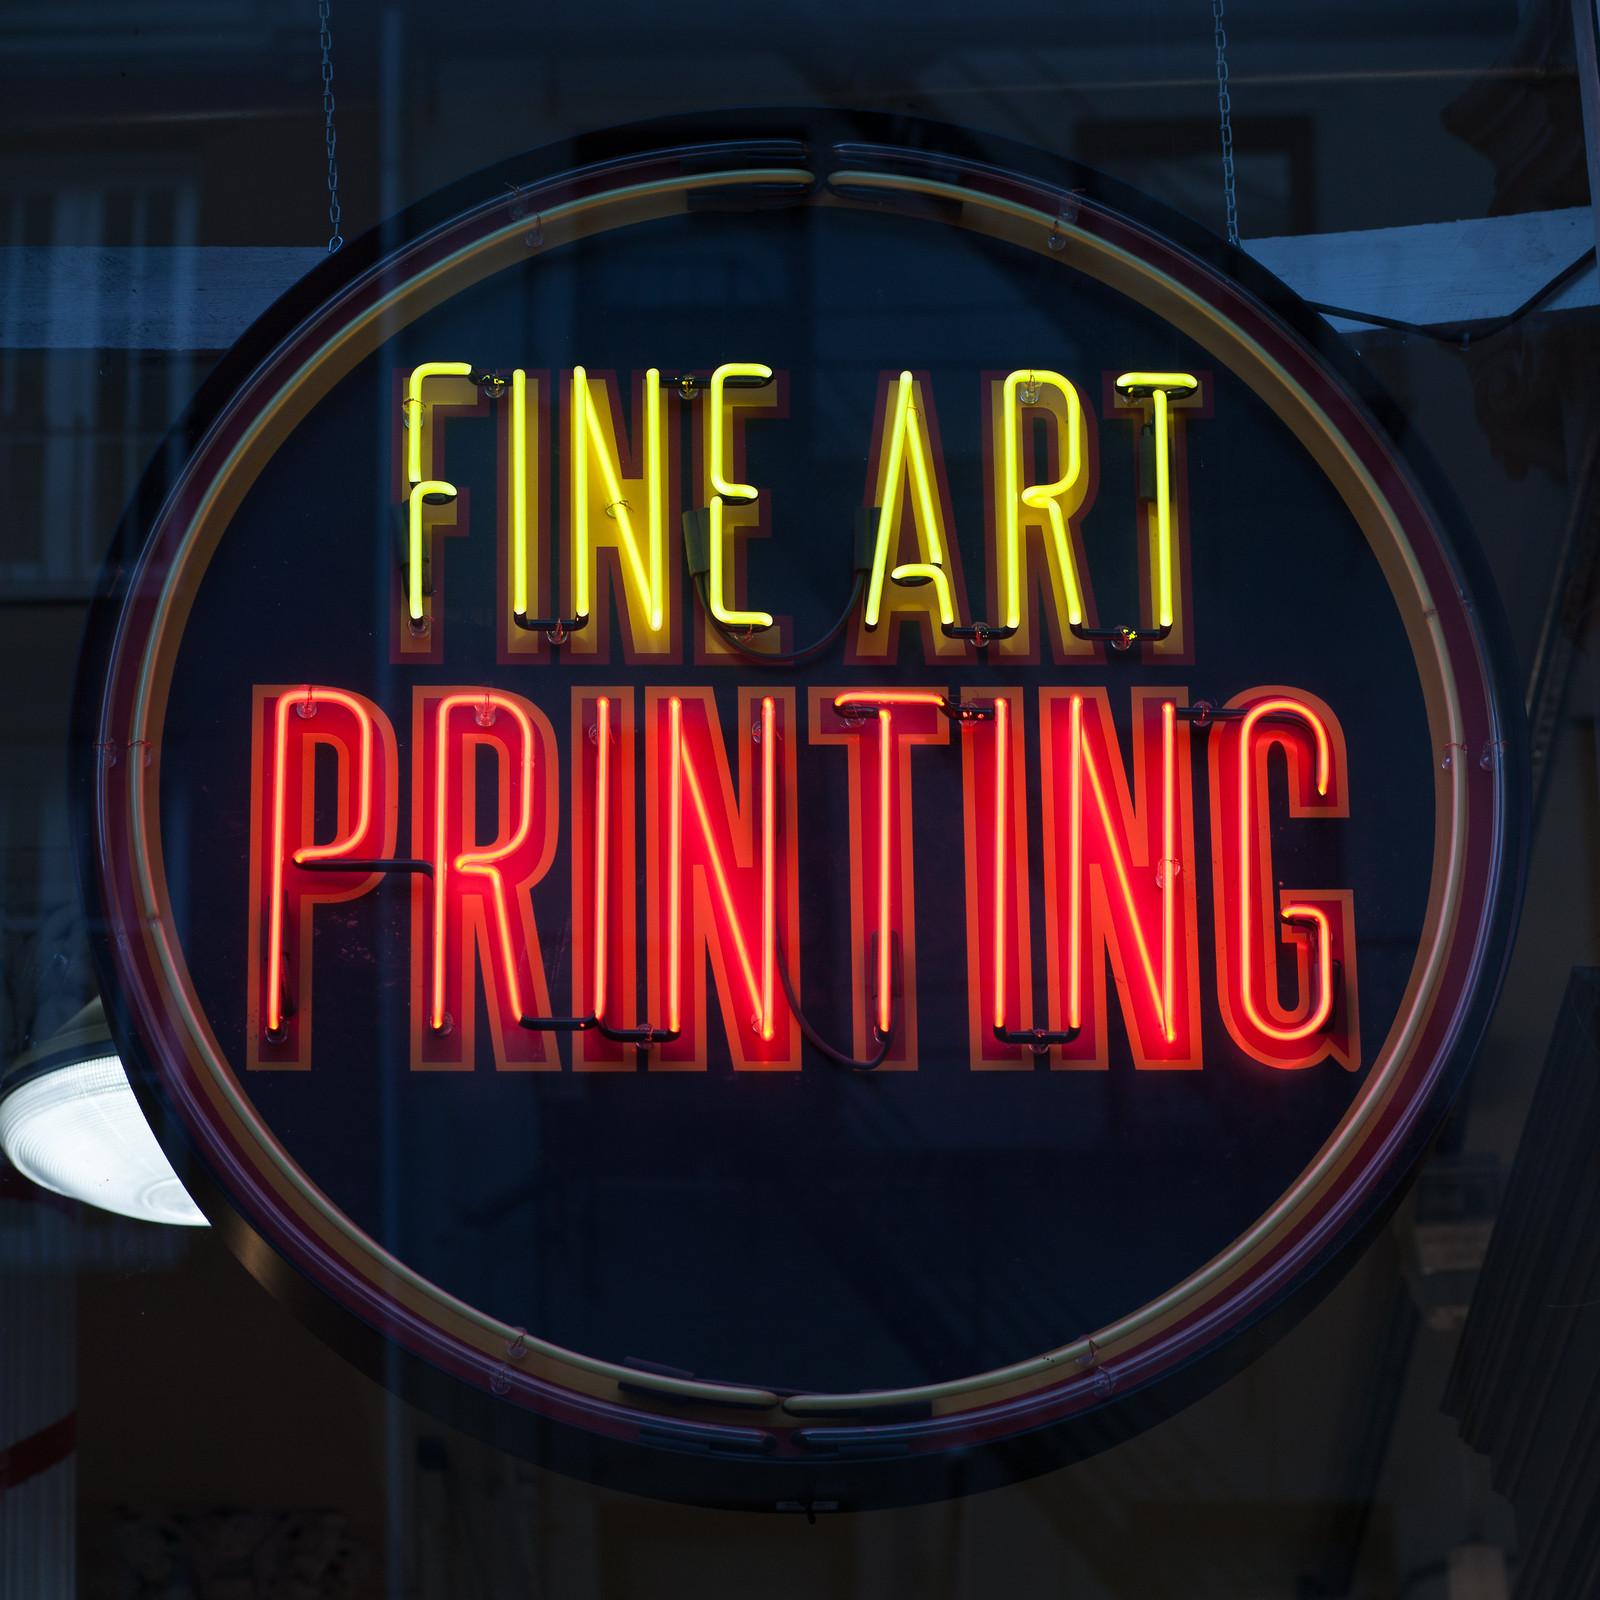 Fine Art PRINTING by wwward0